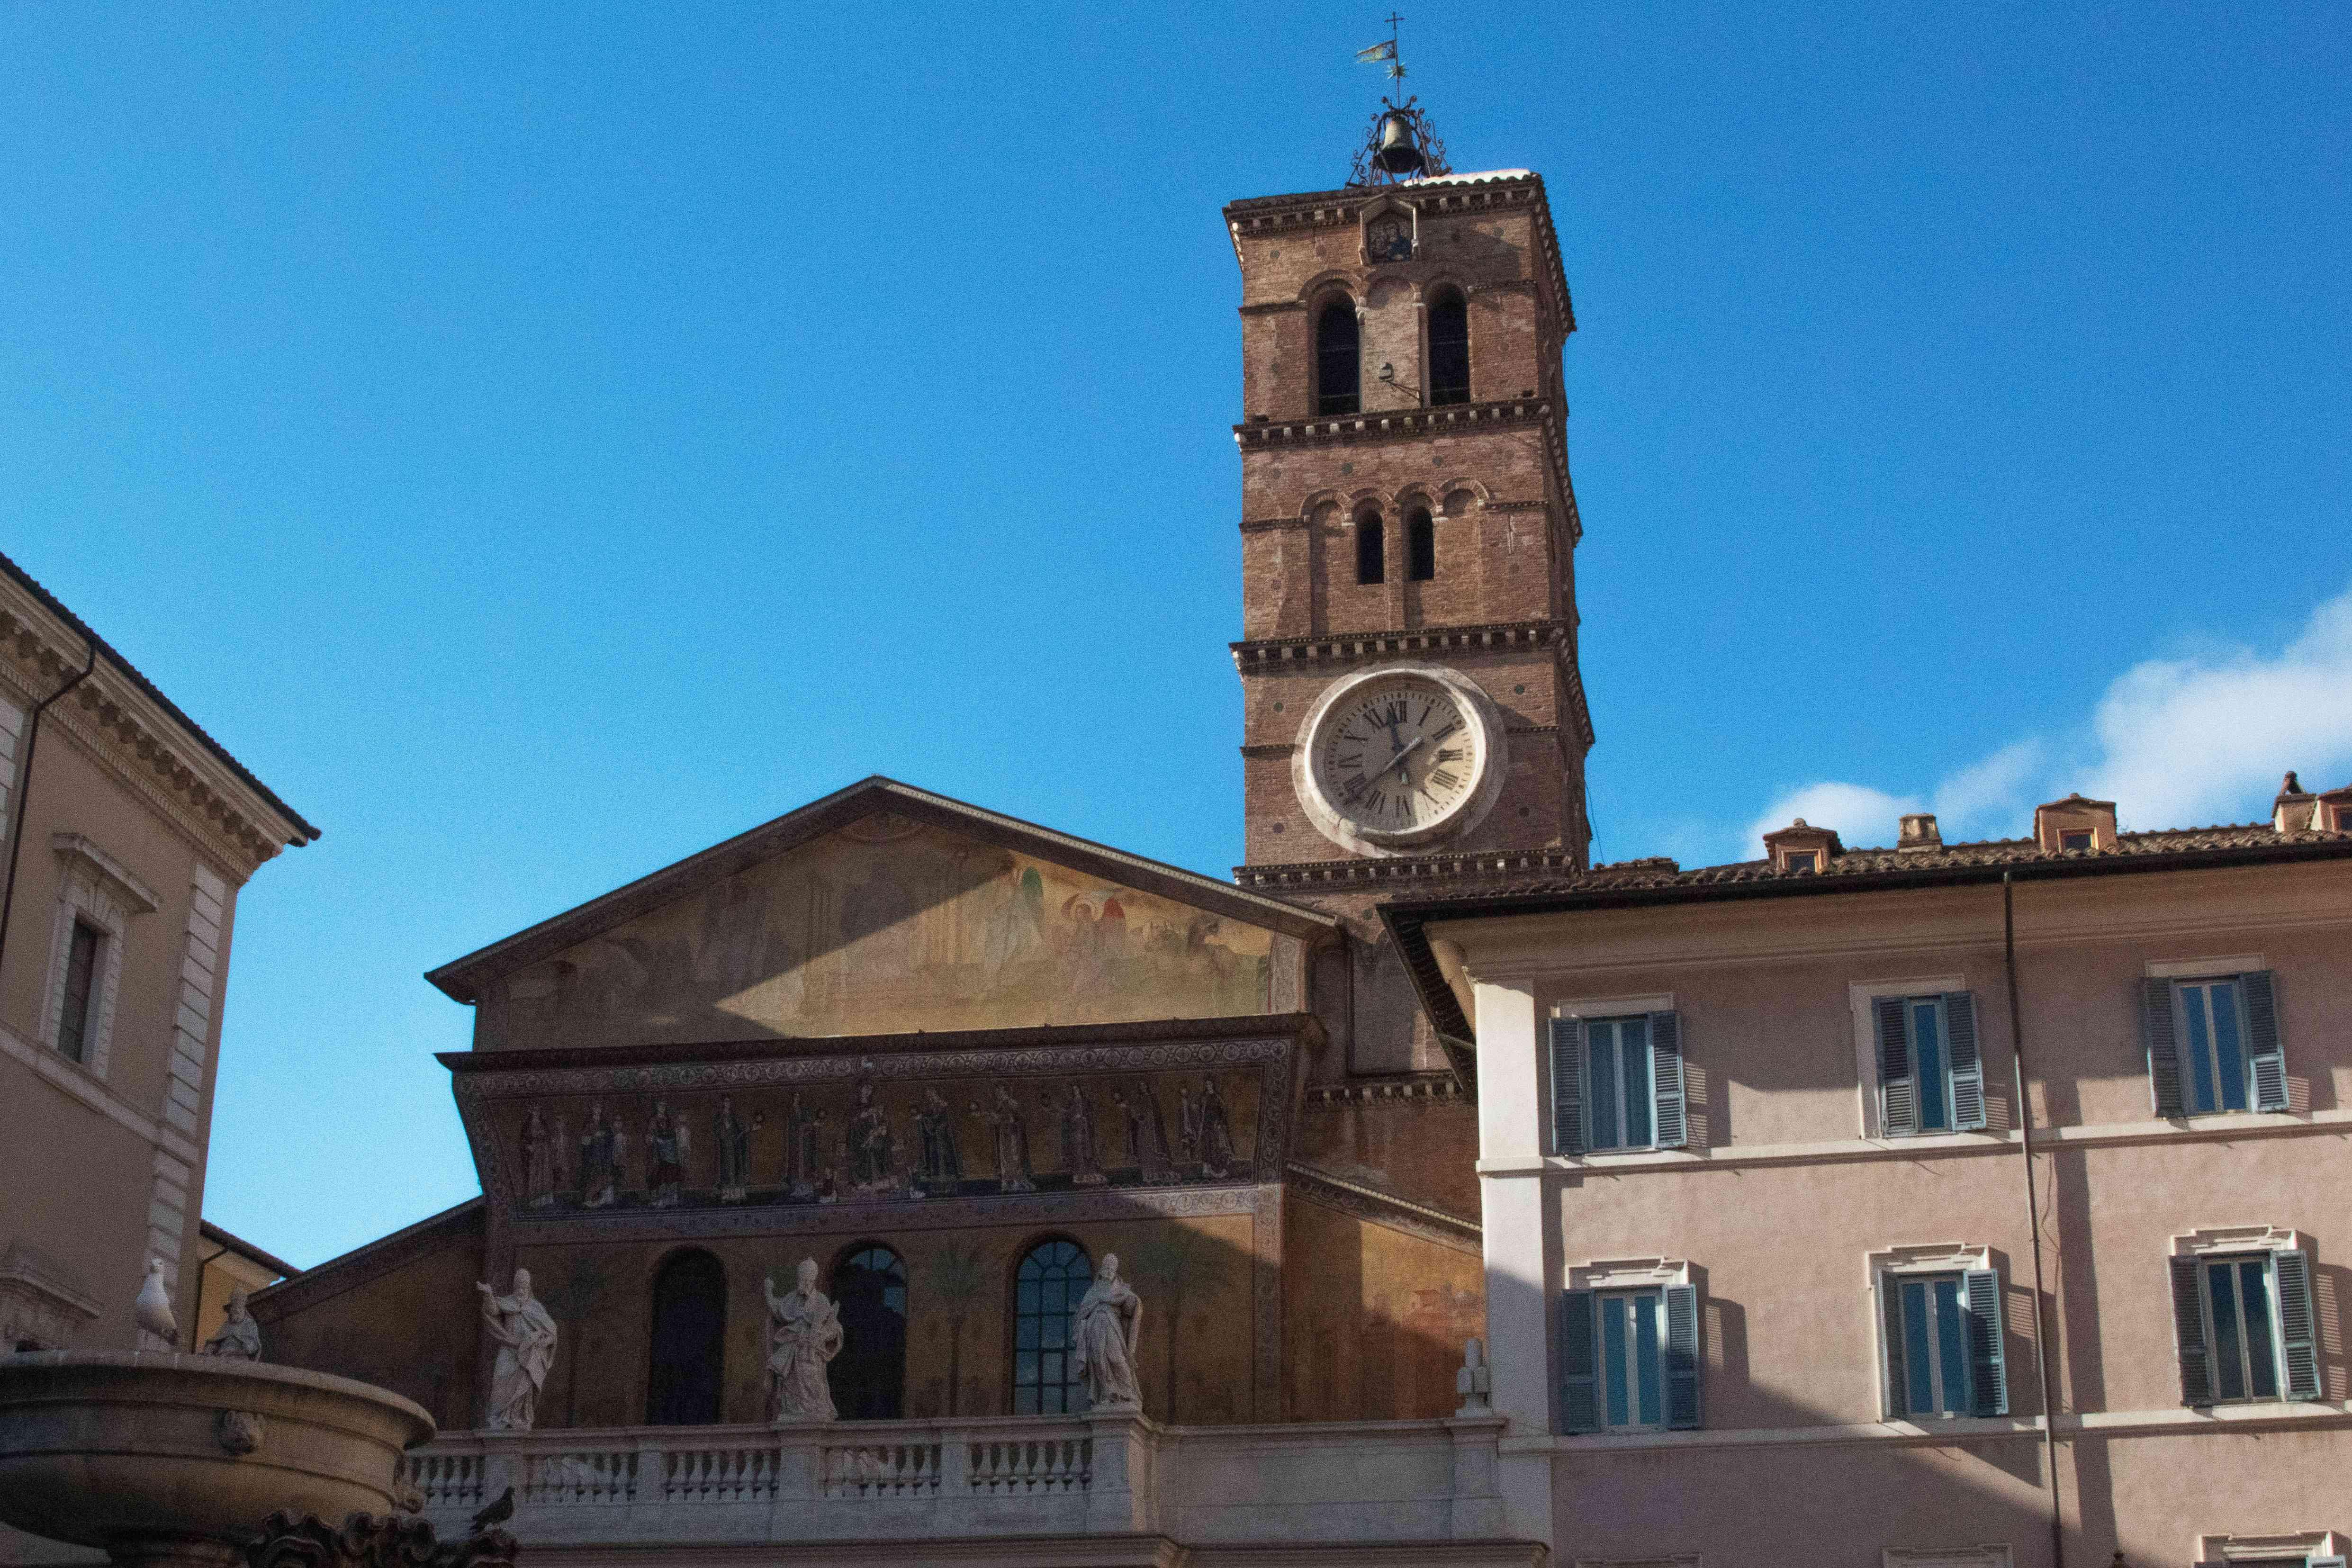 La arquitectura alrededor de la Piazza di Santa Maria in Trastevere